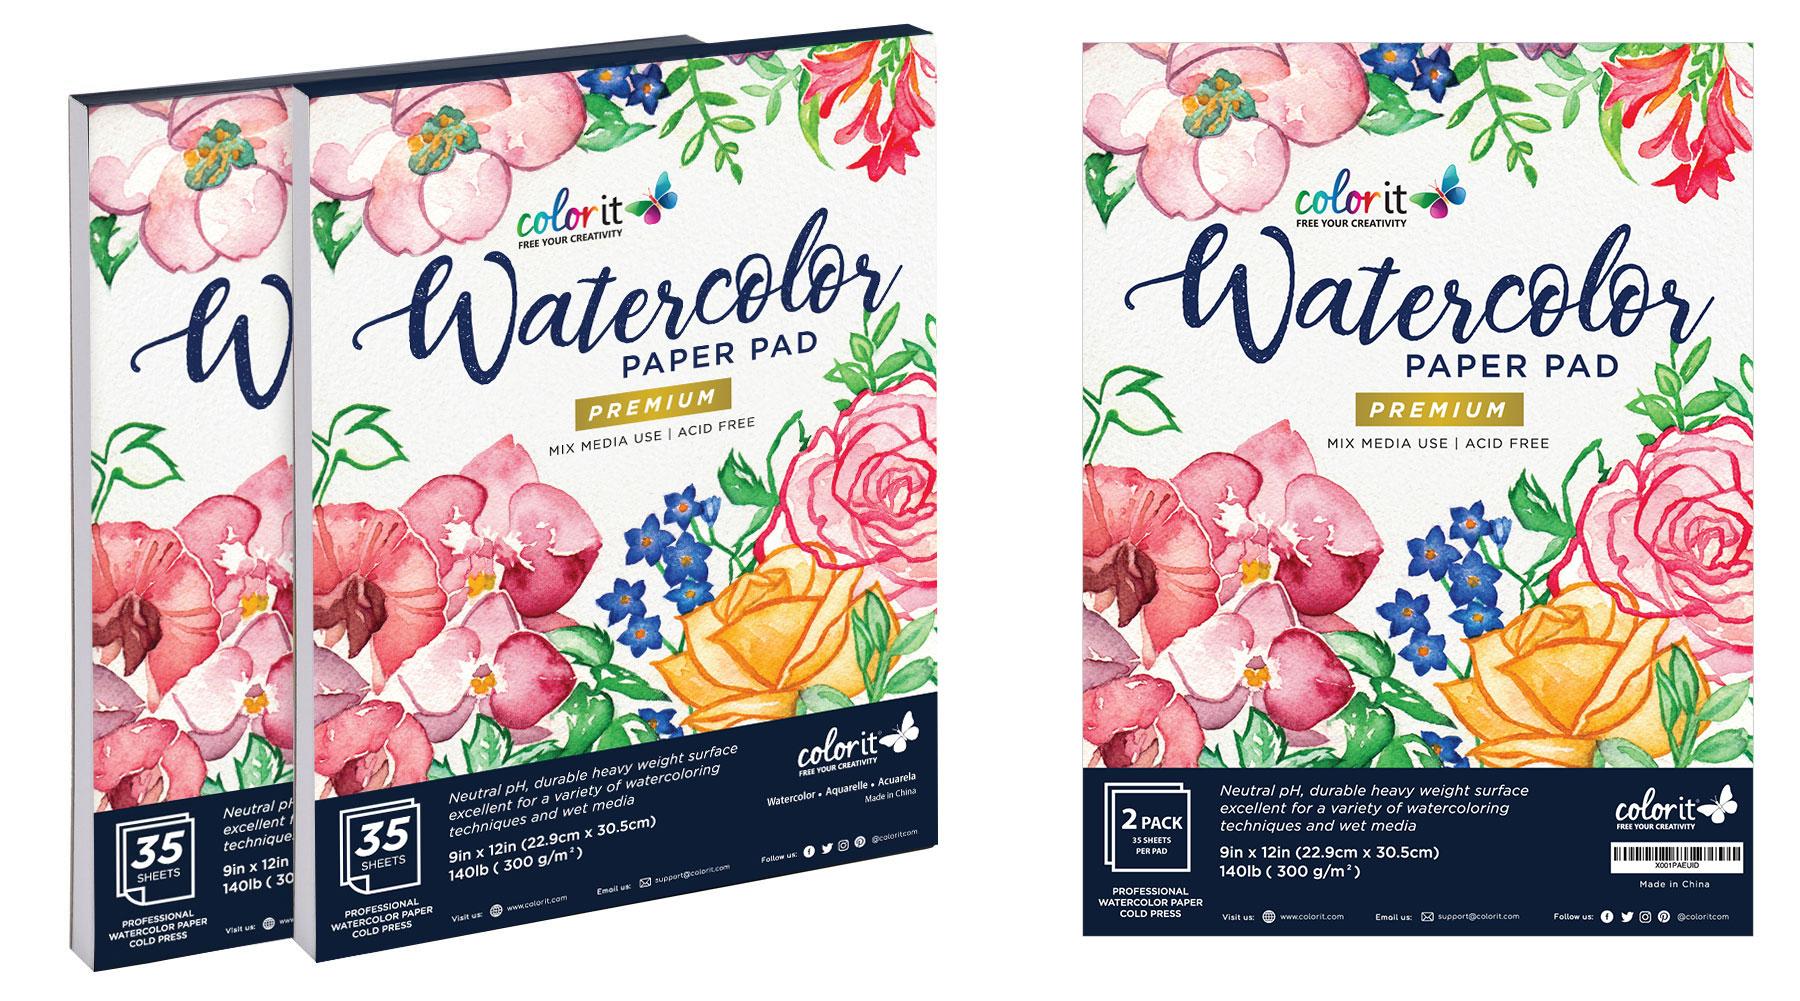 ColorIt watercolor paper pads